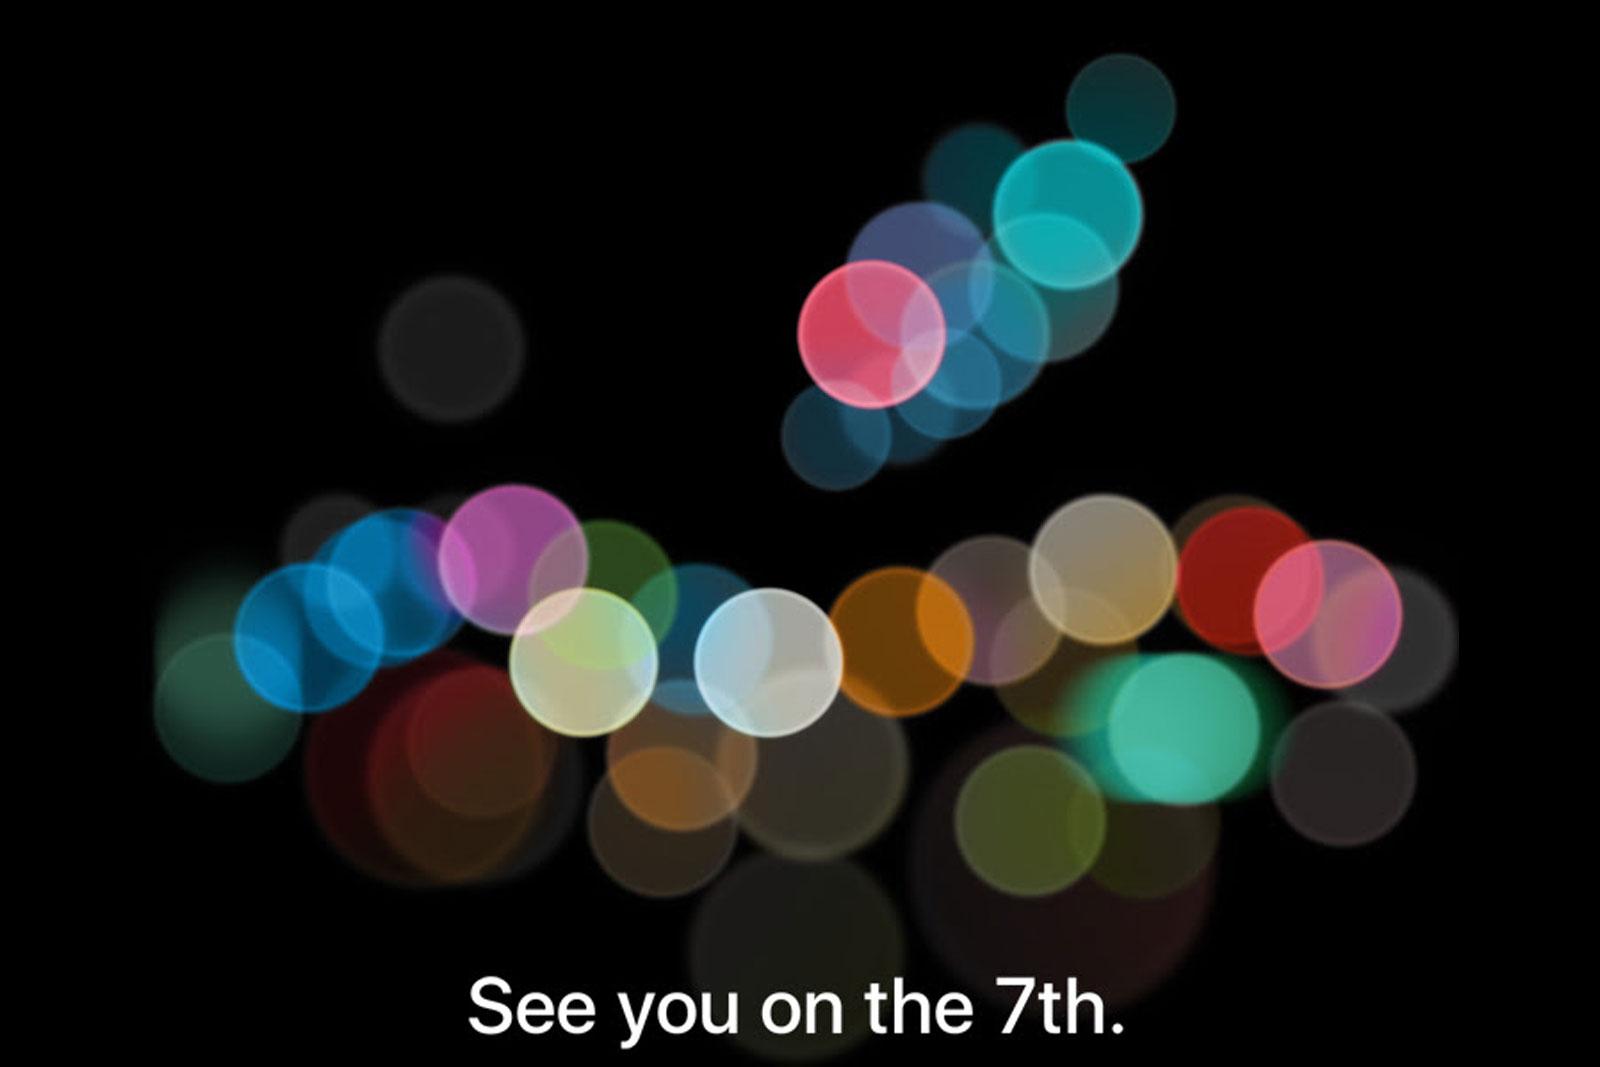 iphone-invitation